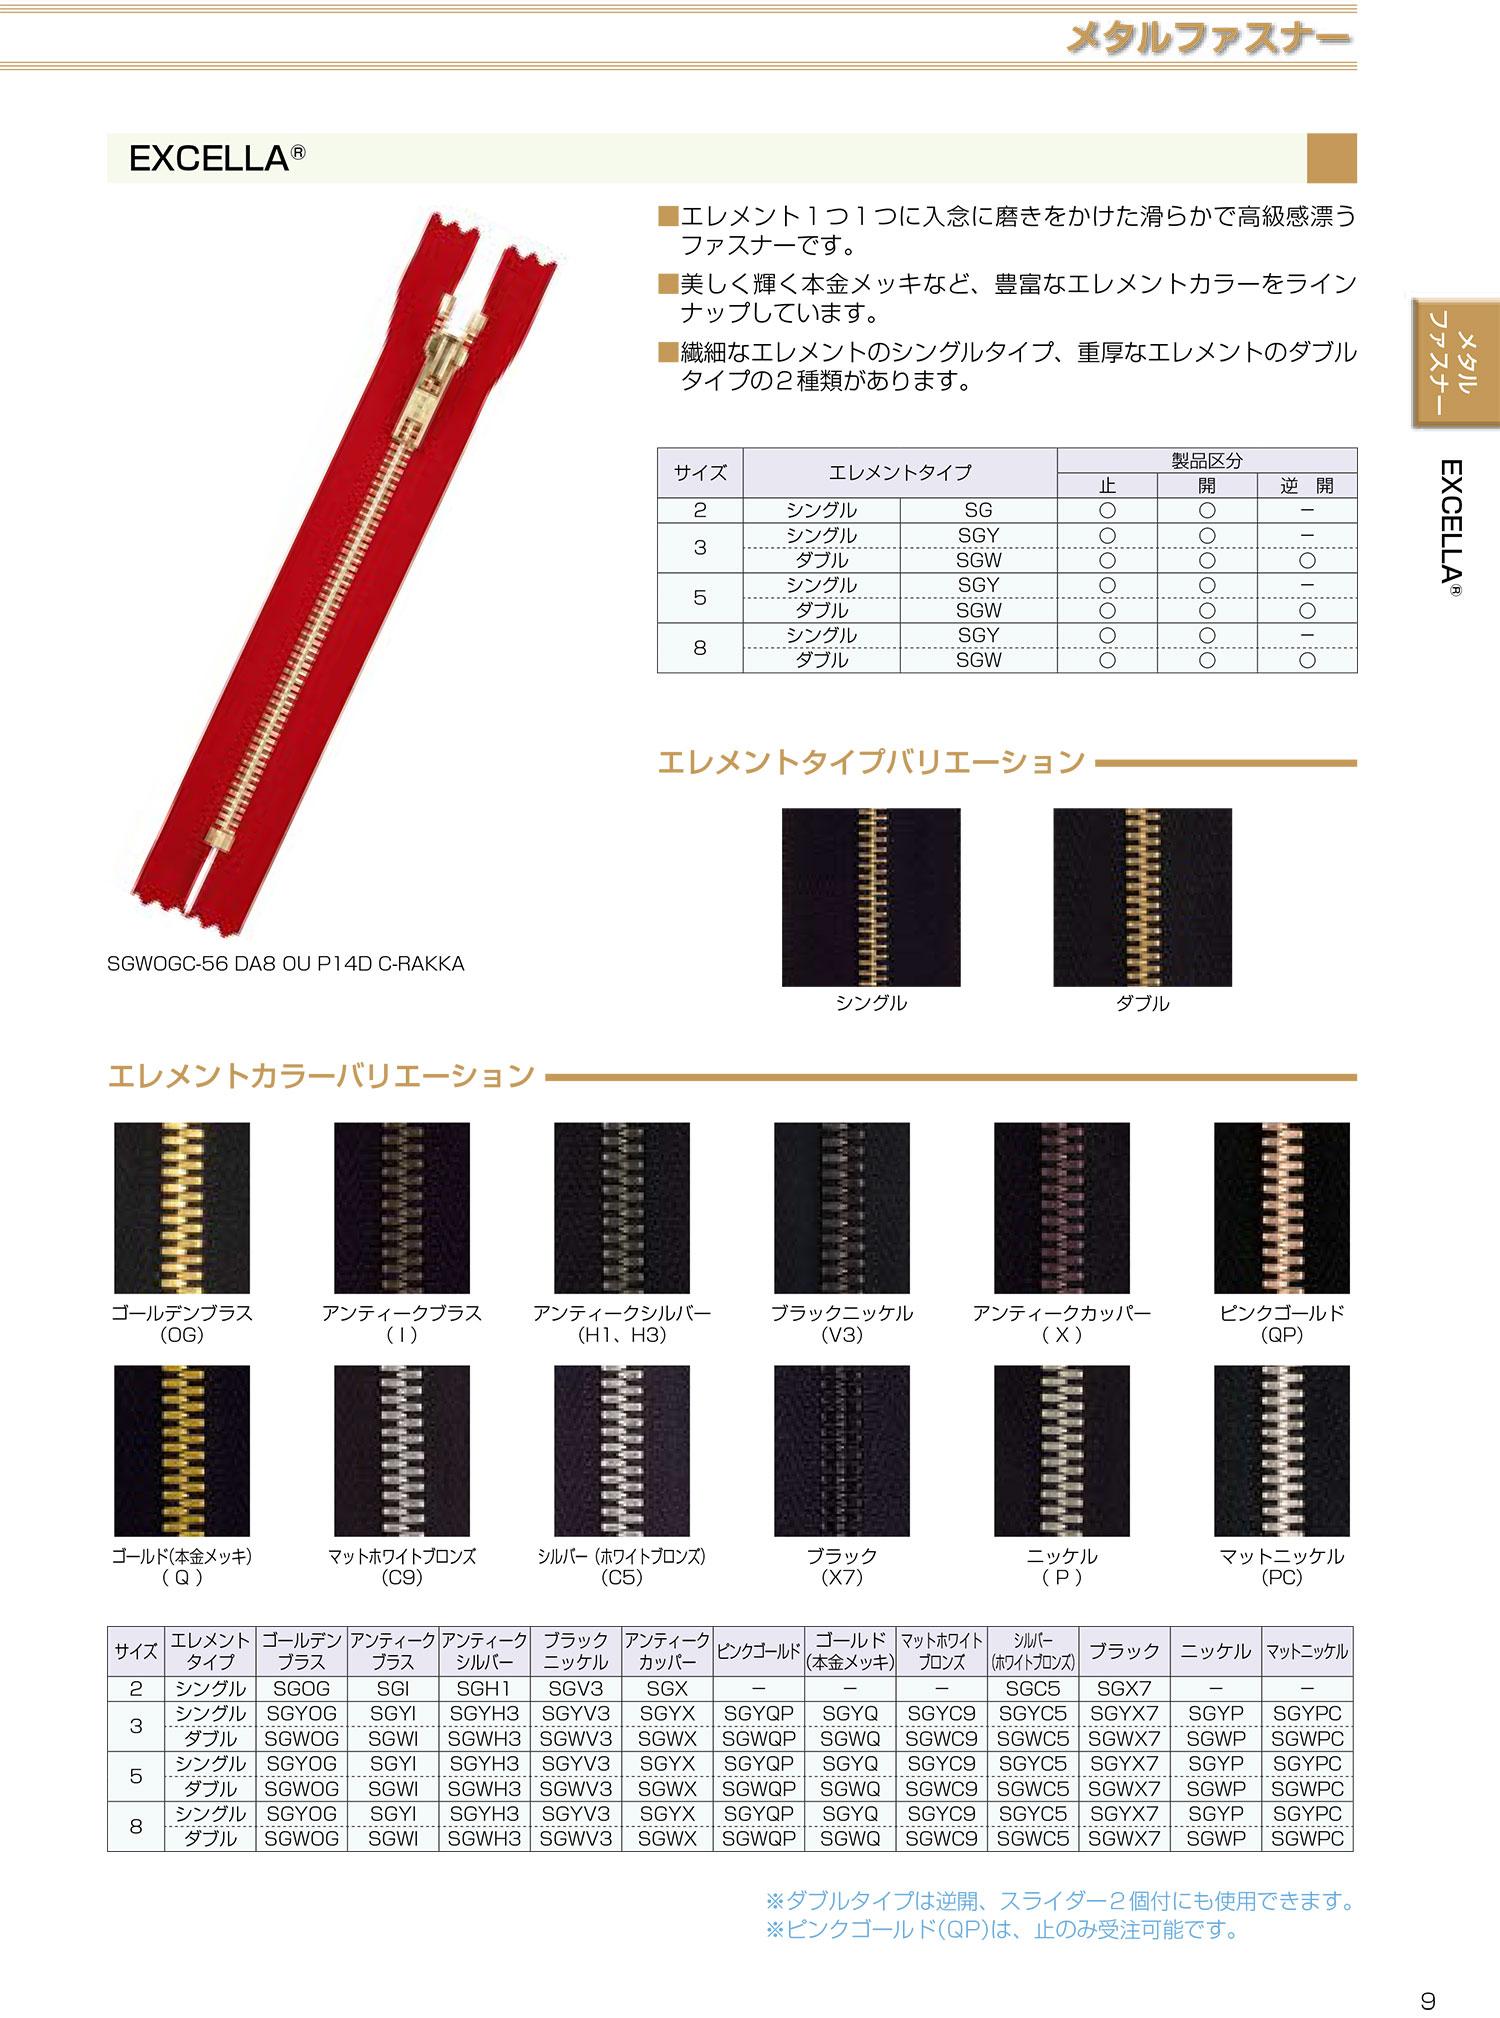 5SGWC9OR エクセラ 5サイズ マットホワイトブロンズ オープン ダブル[ファスナー] YKK/オークラ商事 - ApparelX アパレル資材卸通販